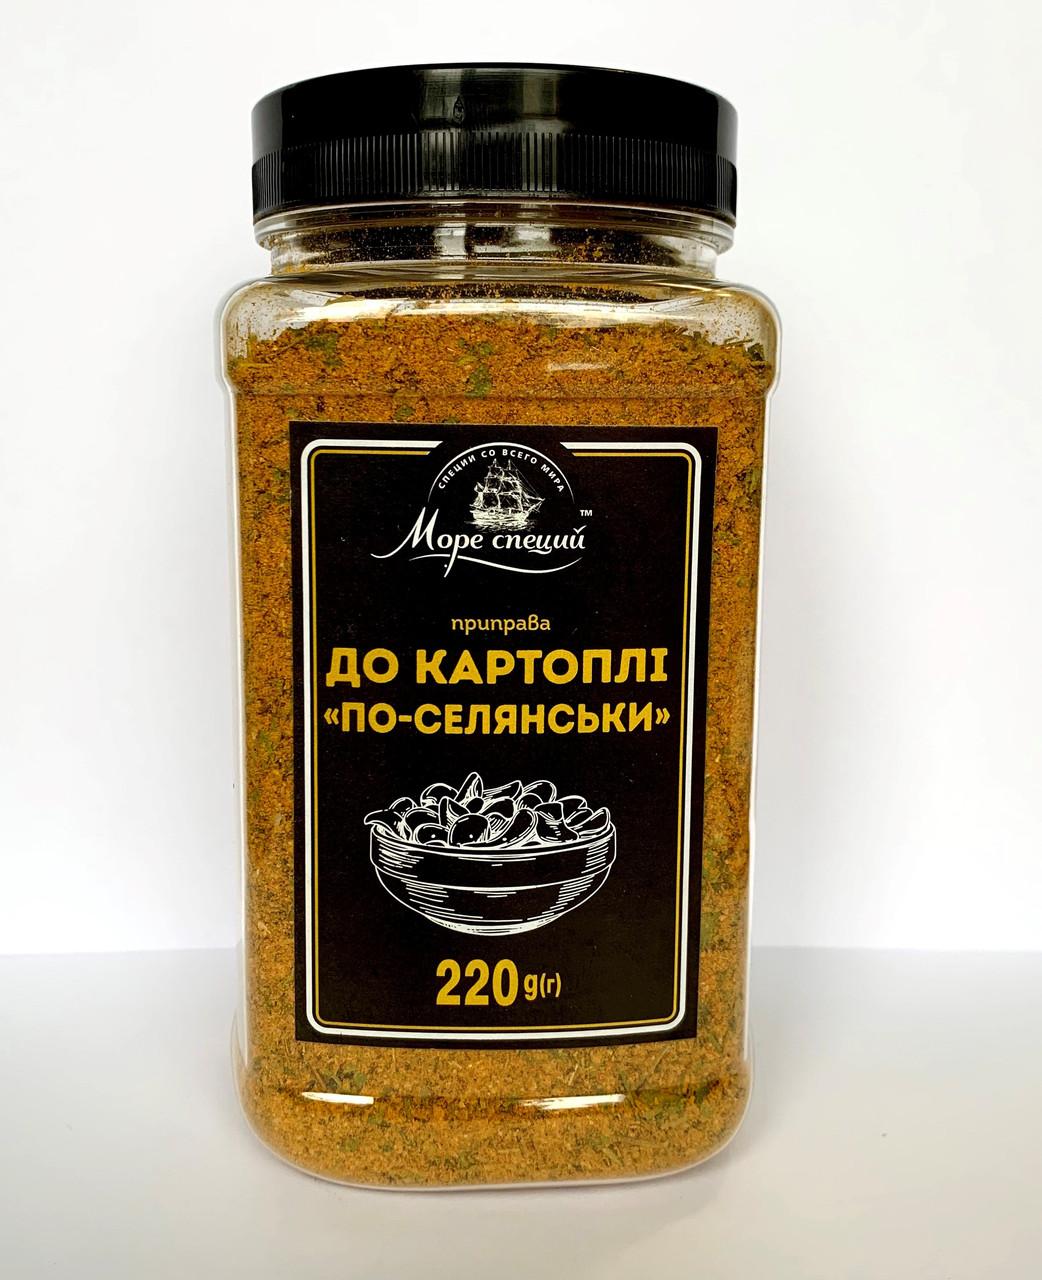 "Приправа До картоплі по-селянськи"" 220 г., баночка п/е"